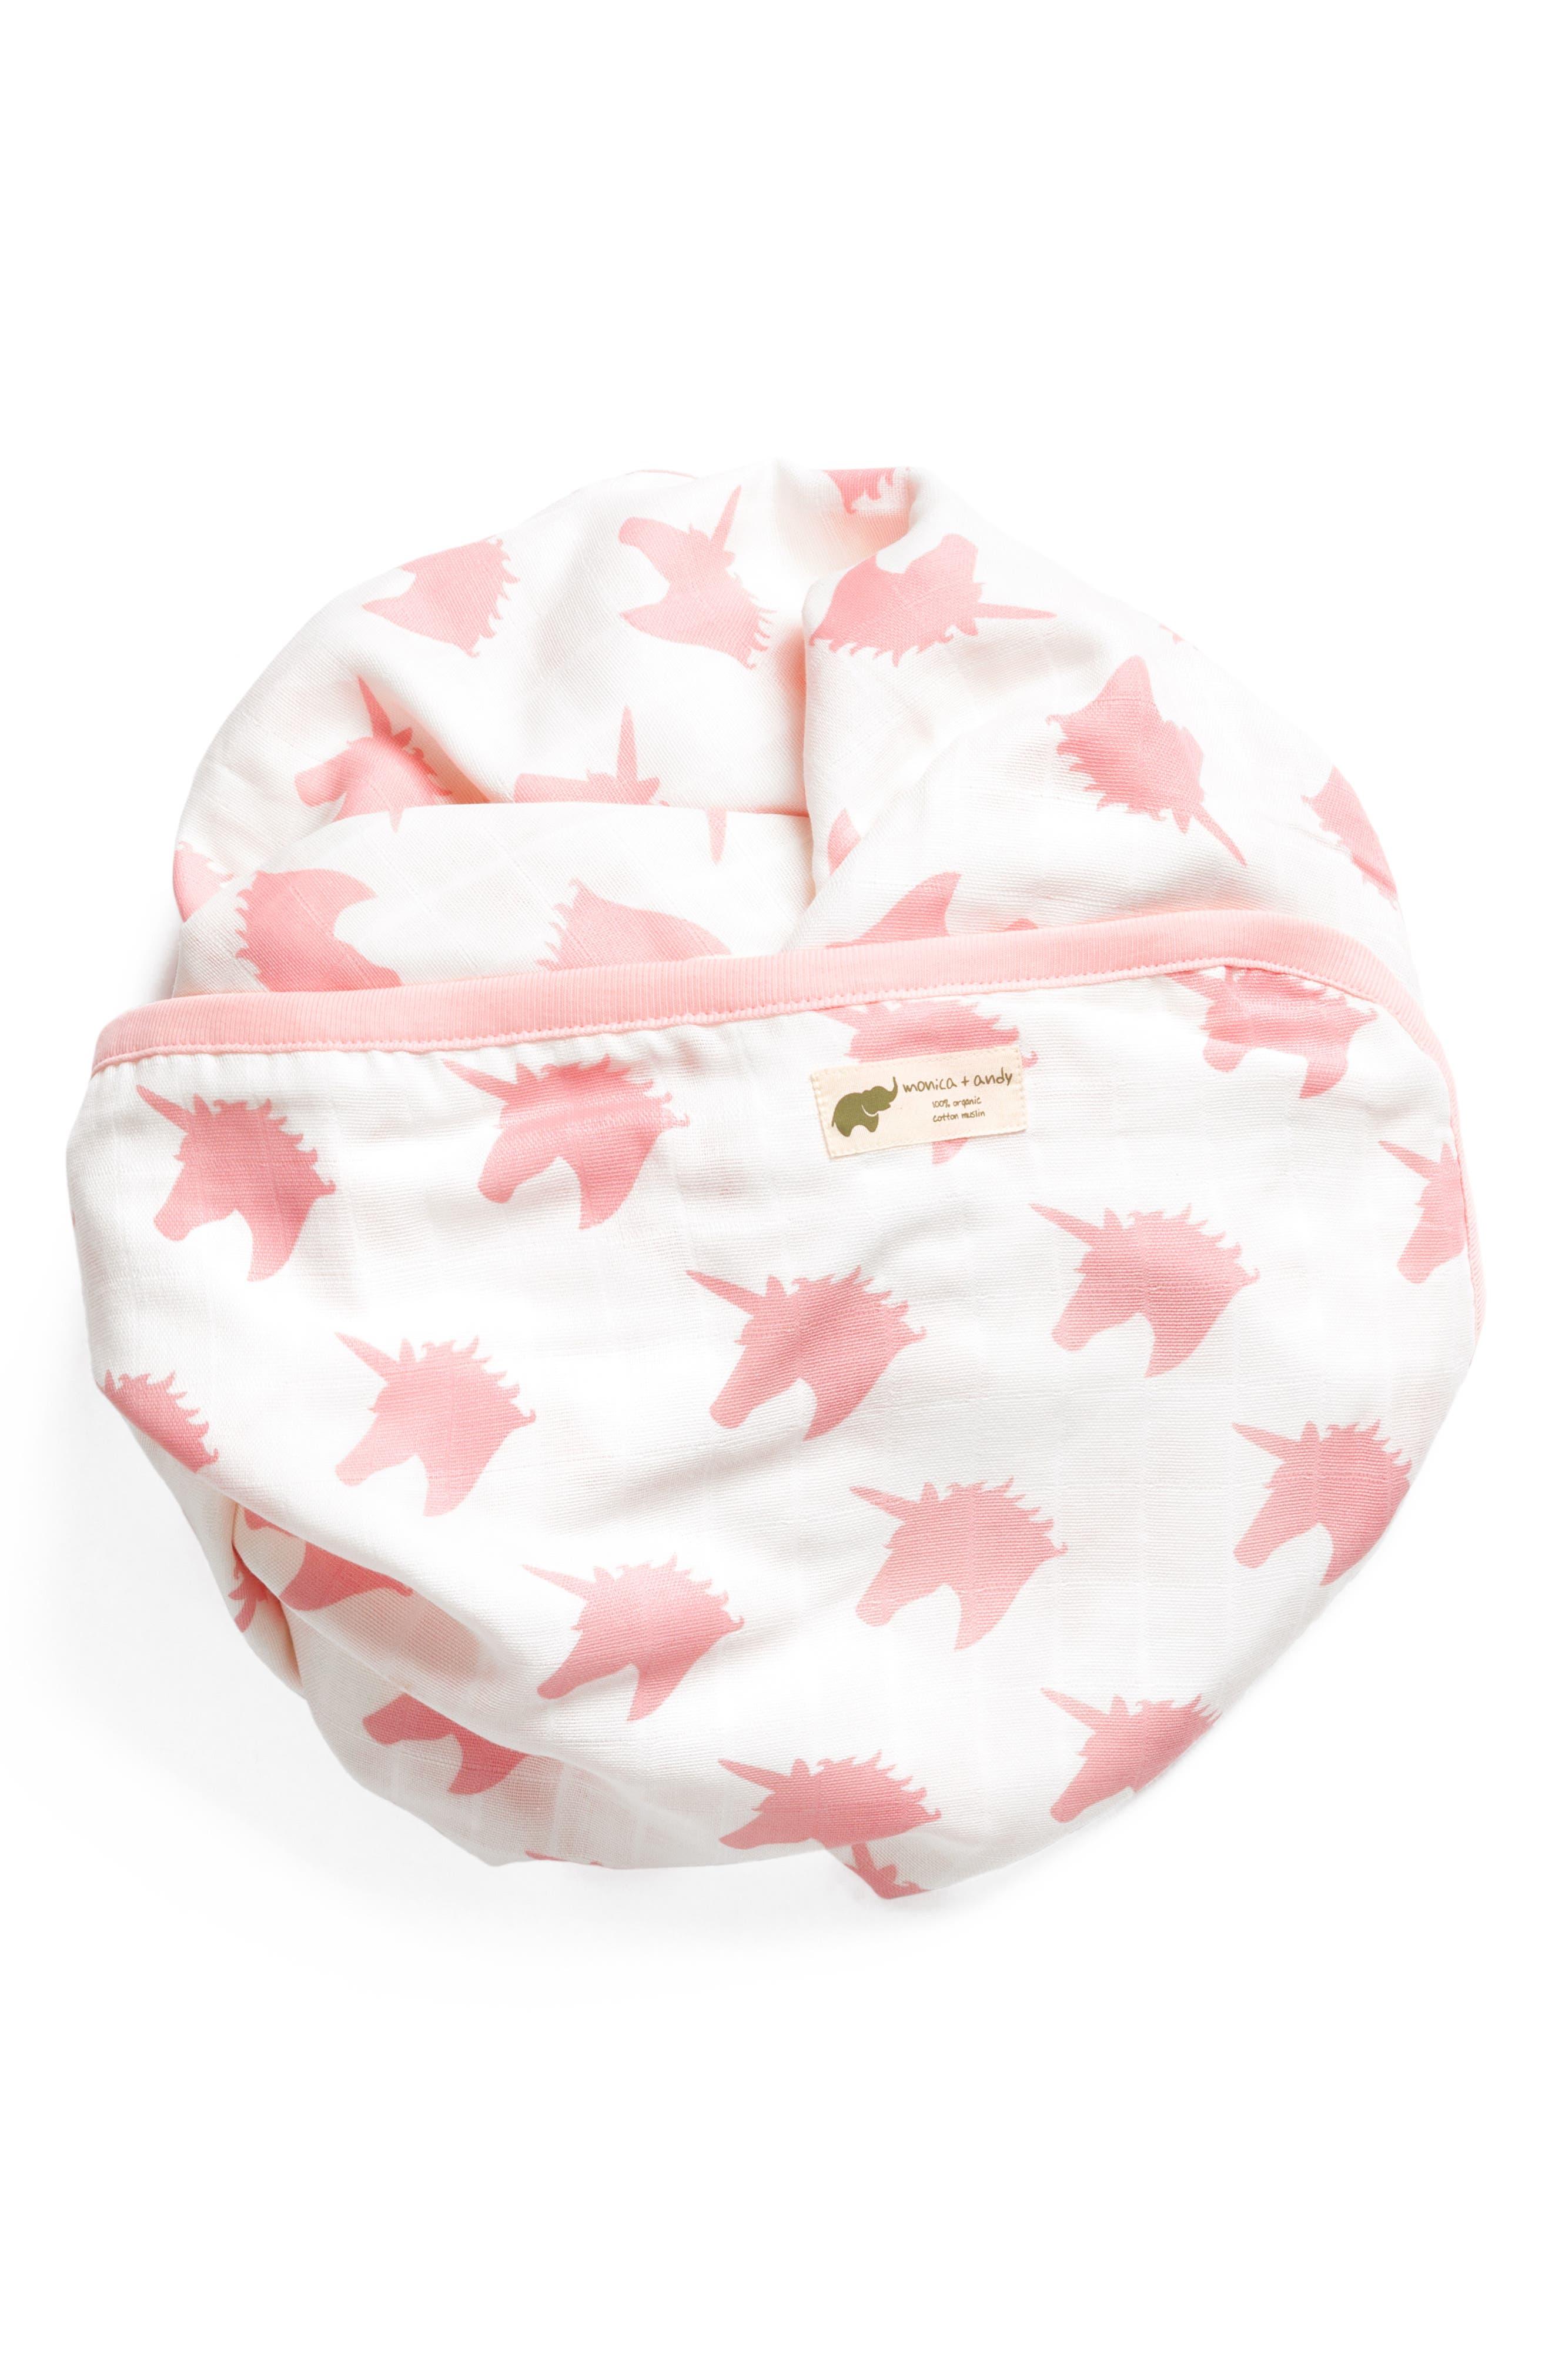 MONICA + ANDY, Believe in Unicorns Organic Cotton Always Blanket, Main thumbnail 1, color, BELIEVE IN UNICORNS